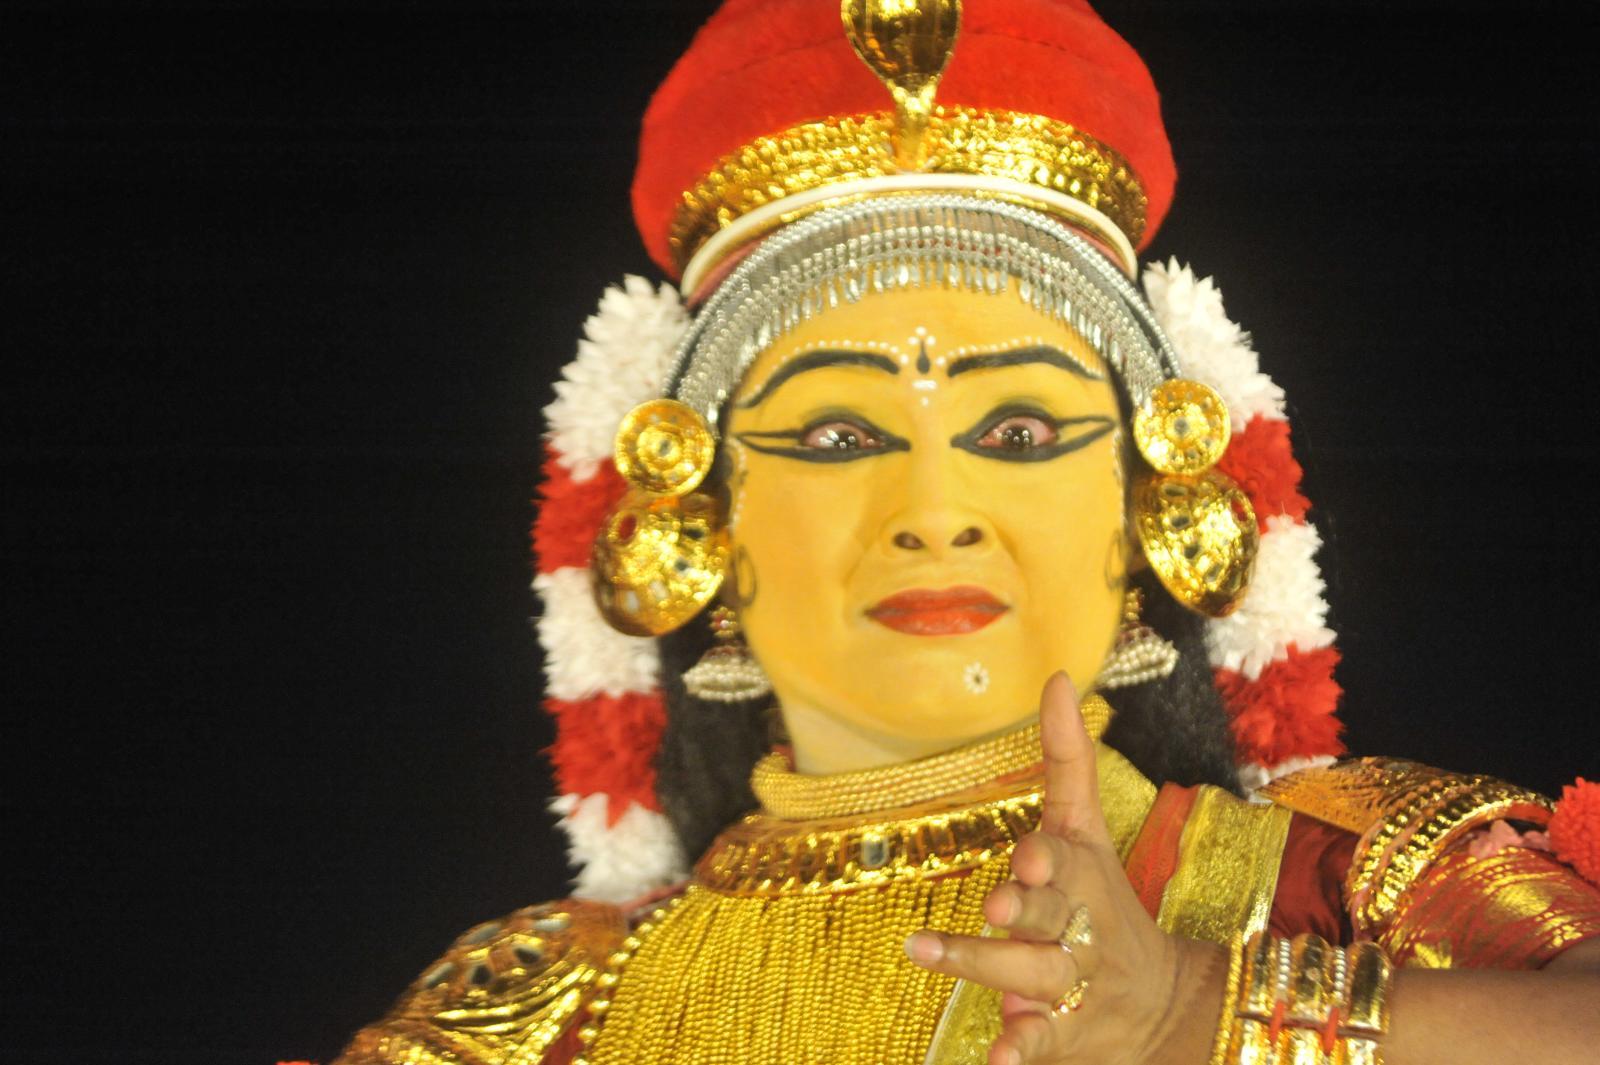 Foresighted tara is feeling sad at Bali's going to fight;  Margi Madhu : Koodiyattam - Bali Vadham